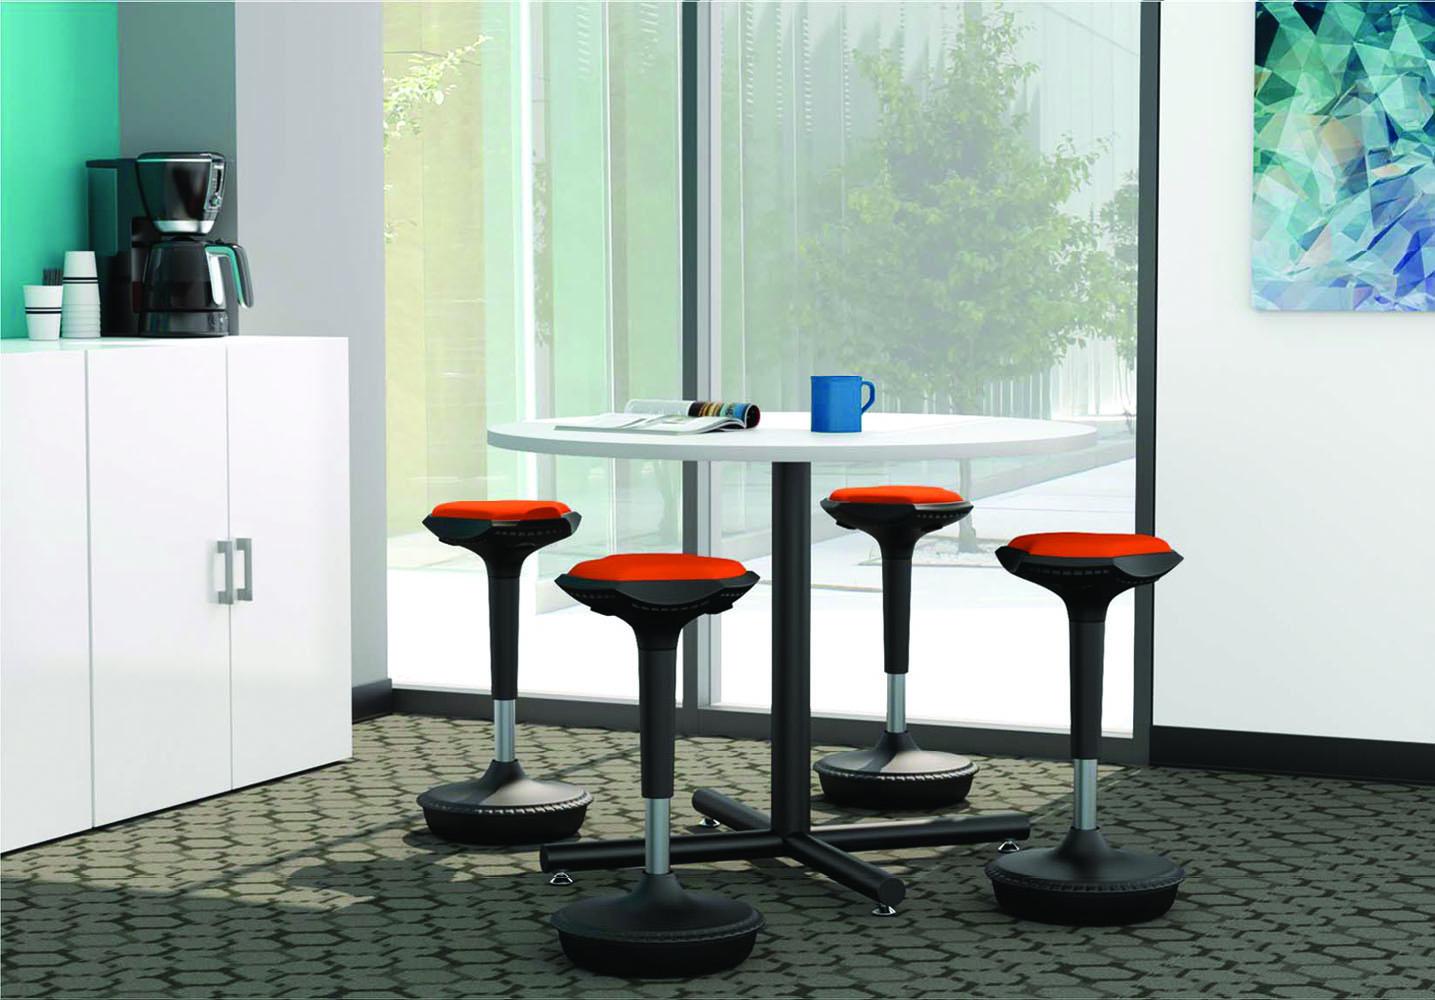 Office Cafeteria Break Room Furniture Office Furniture